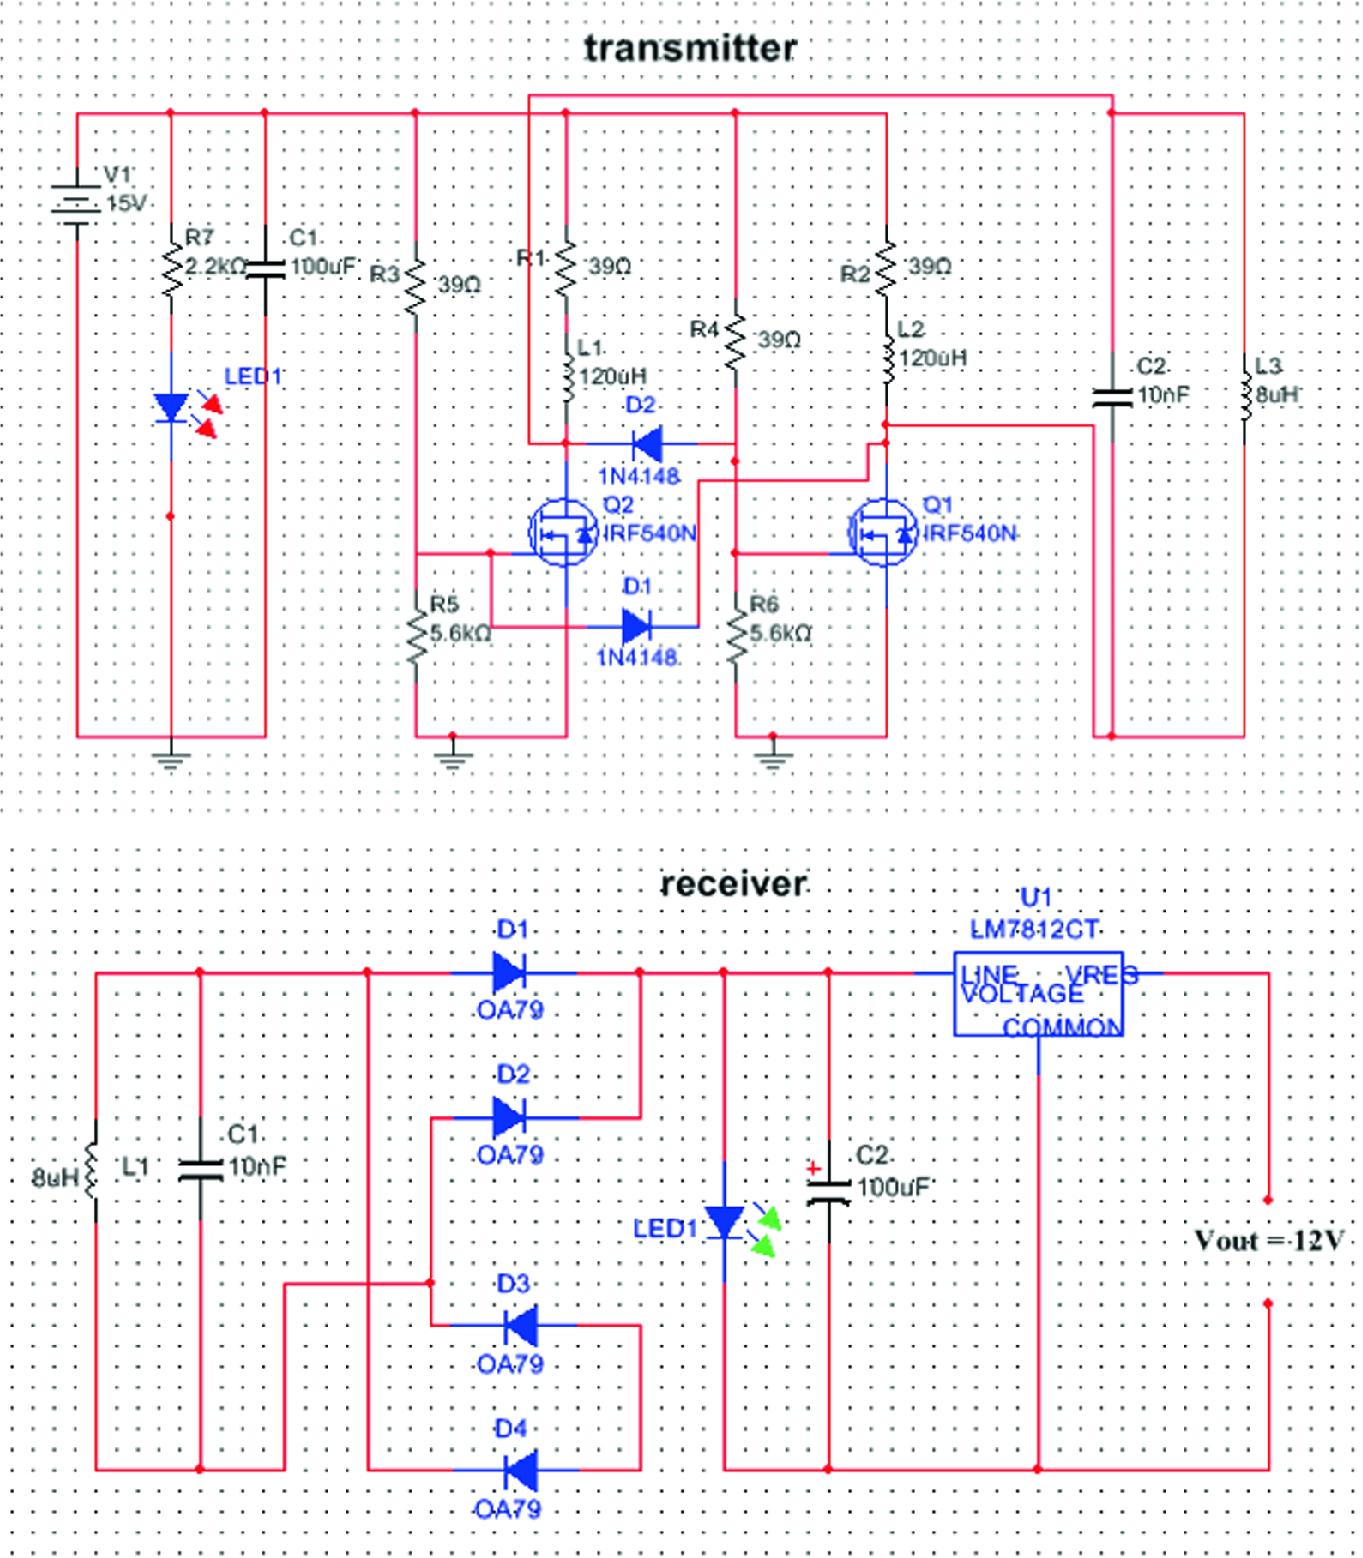 Development of Wireless Power Transfer System with Internet of